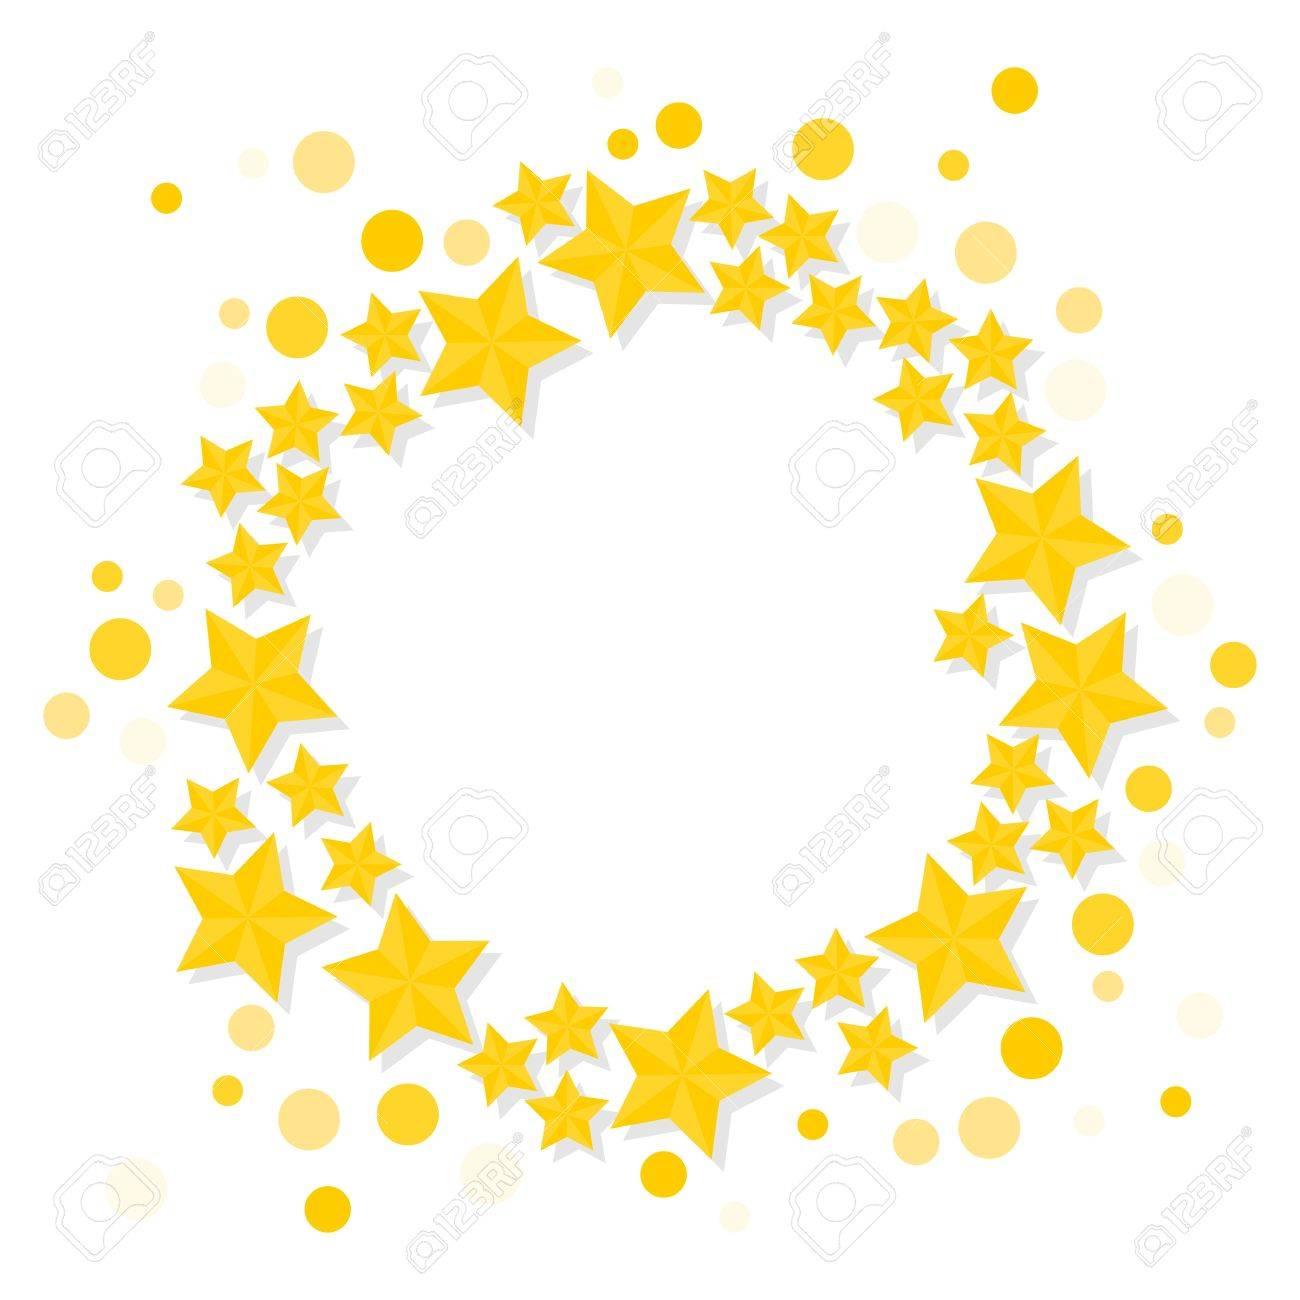 1300x1300 Bright Shiny Golden Stars Wreath Small Medium Big Elements